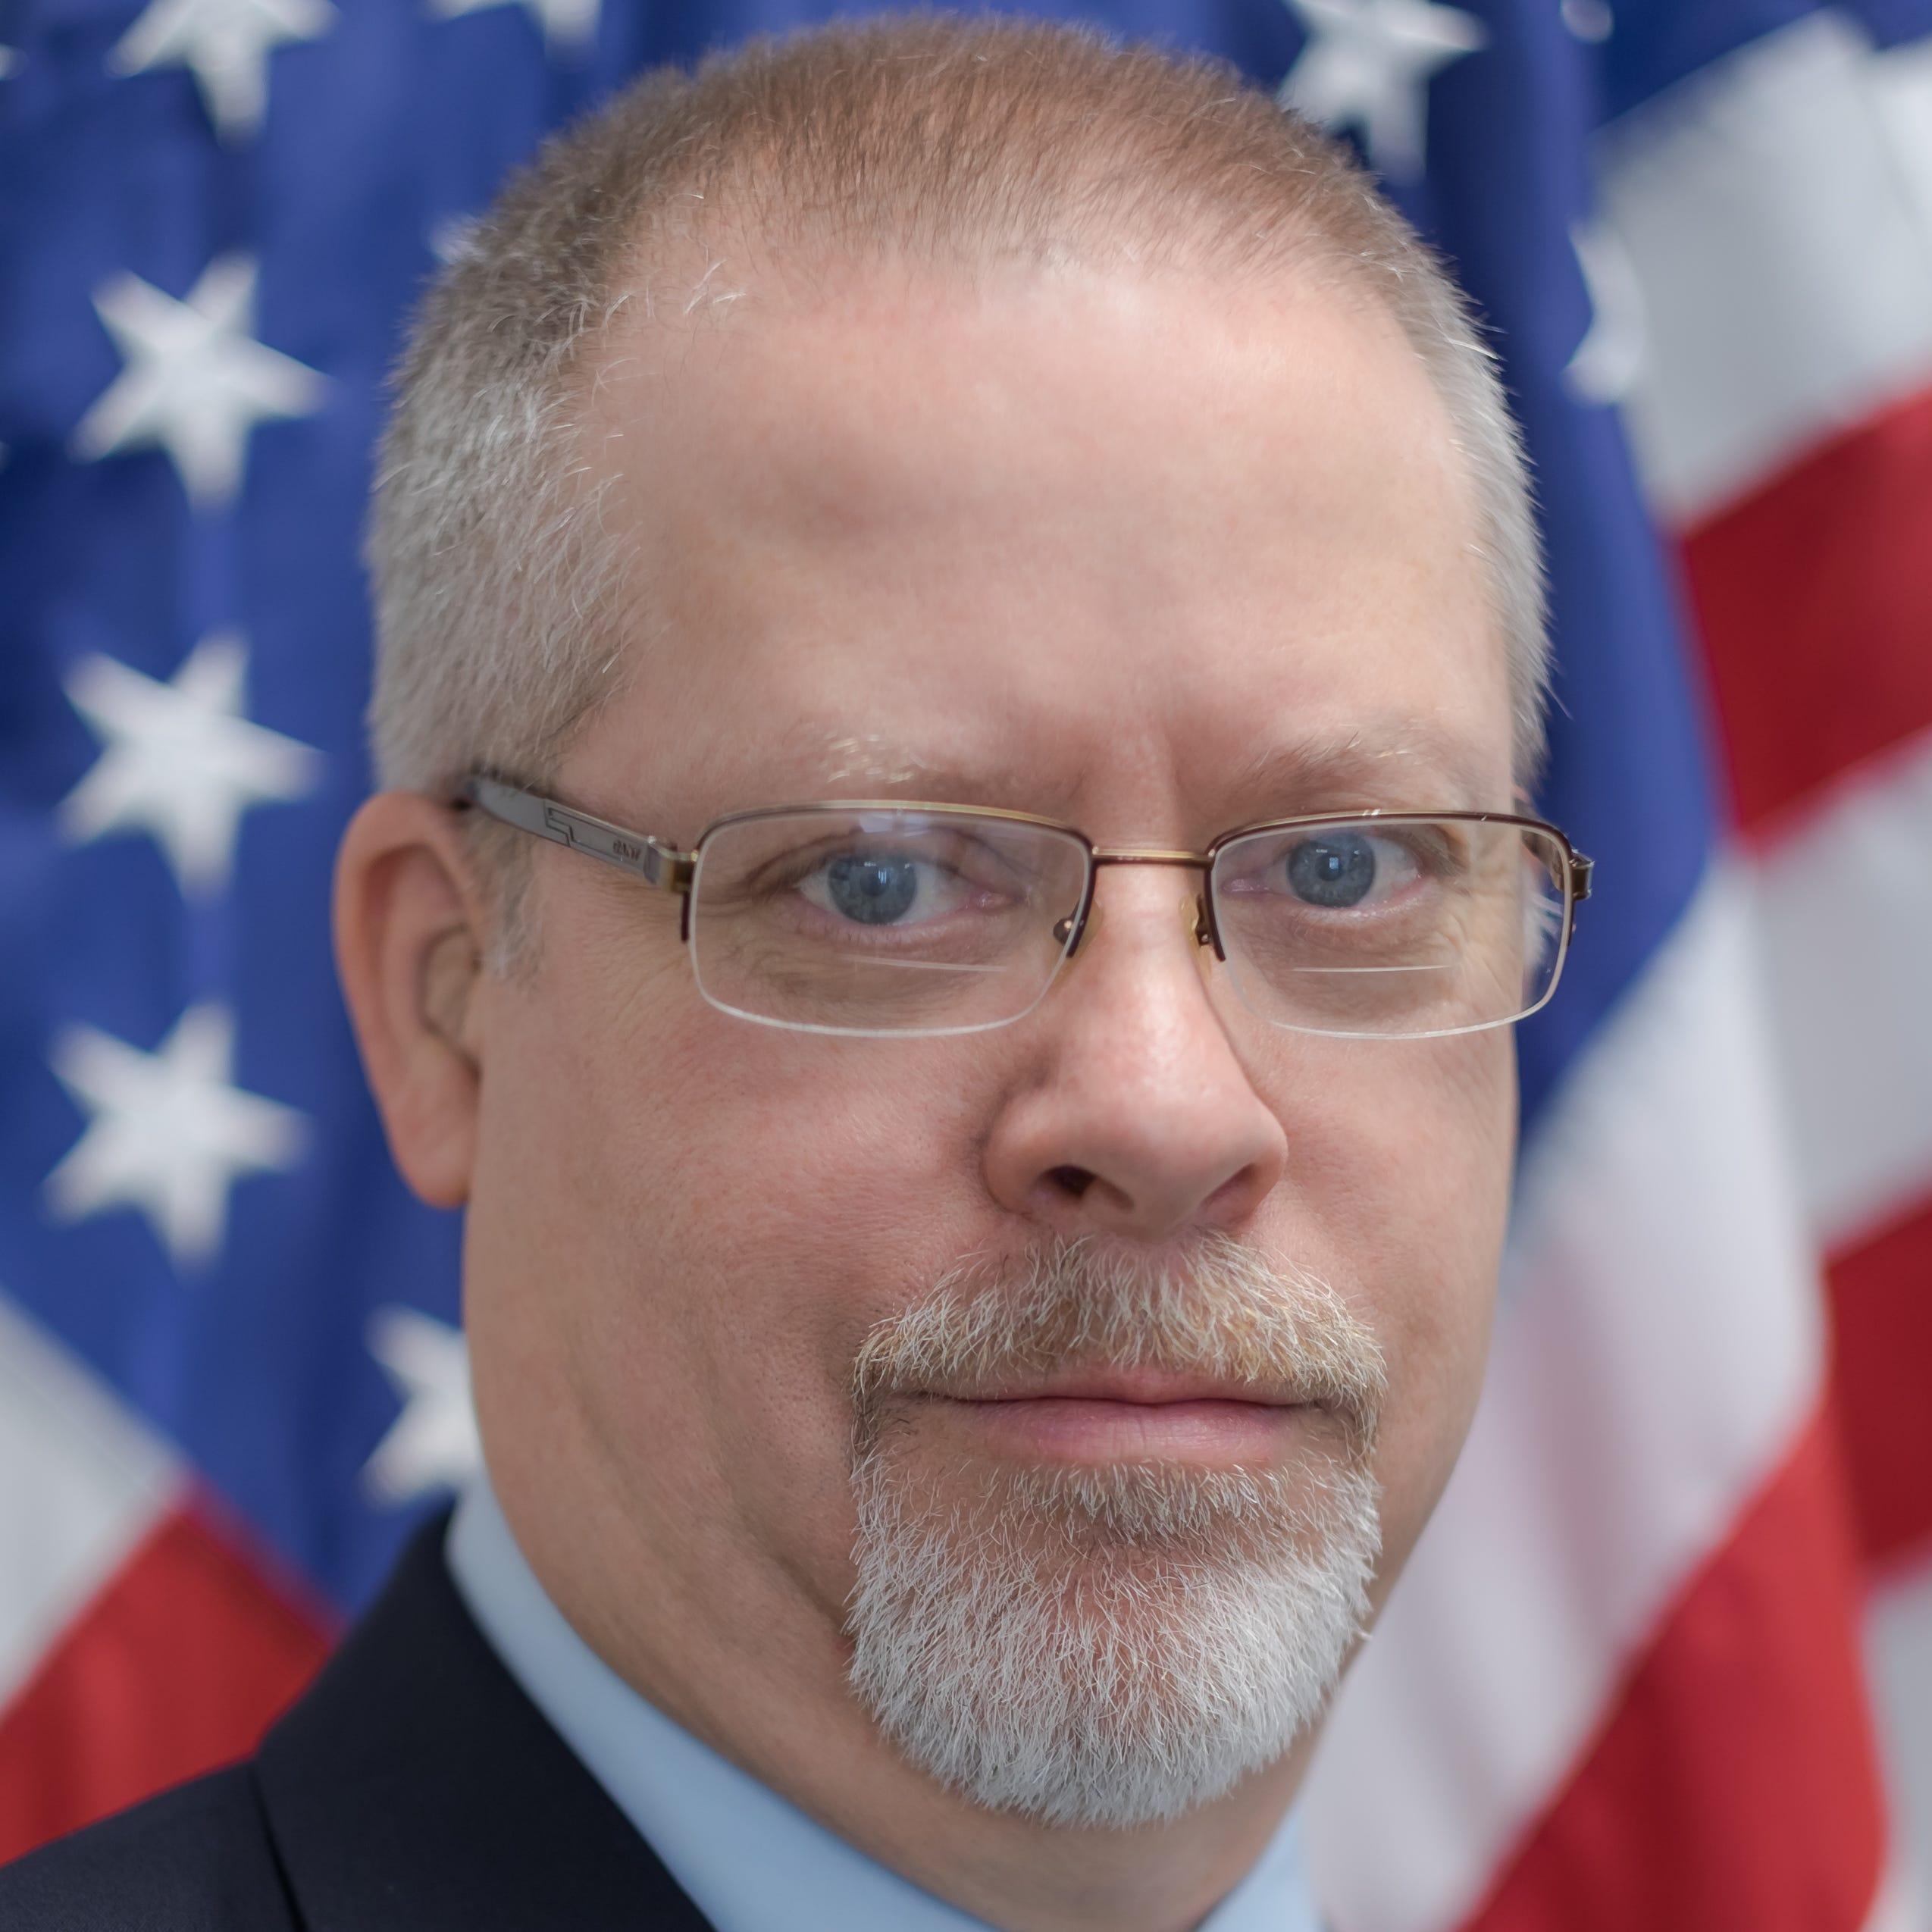 Hiring comes after former superintendent's December ouster